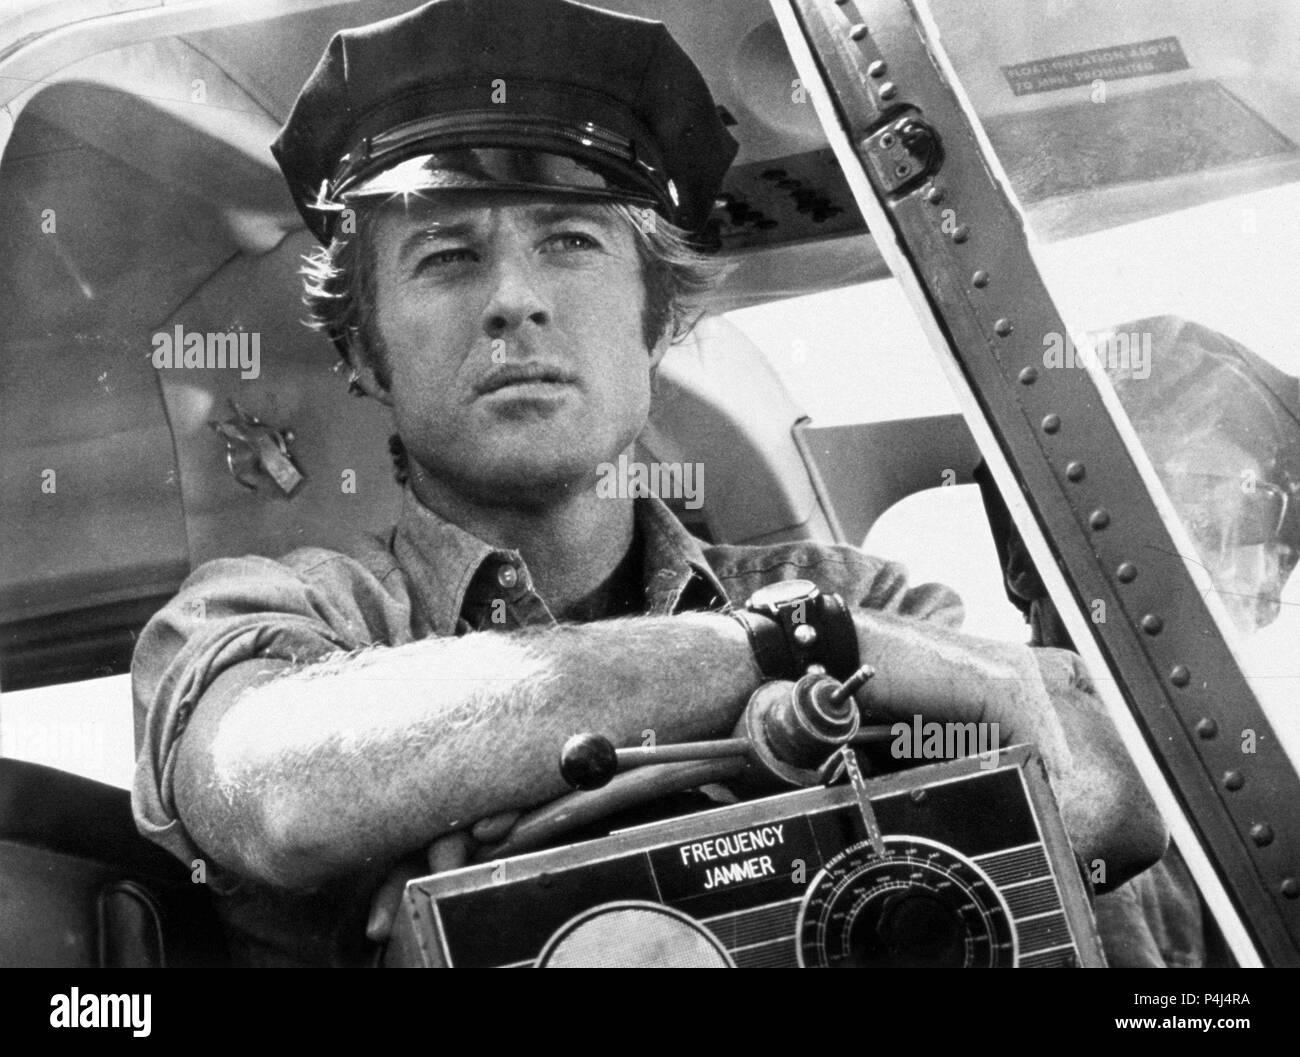 IMAGE(https://c8.alamy.com/comp/P4J4RA/original-film-title-the-hot-rock-english-title-the-hot-rock-film-director-peter-yates-year-1972-stars-robert-redford-credit-20th-century-fox-album-P4J4RA.jpg)